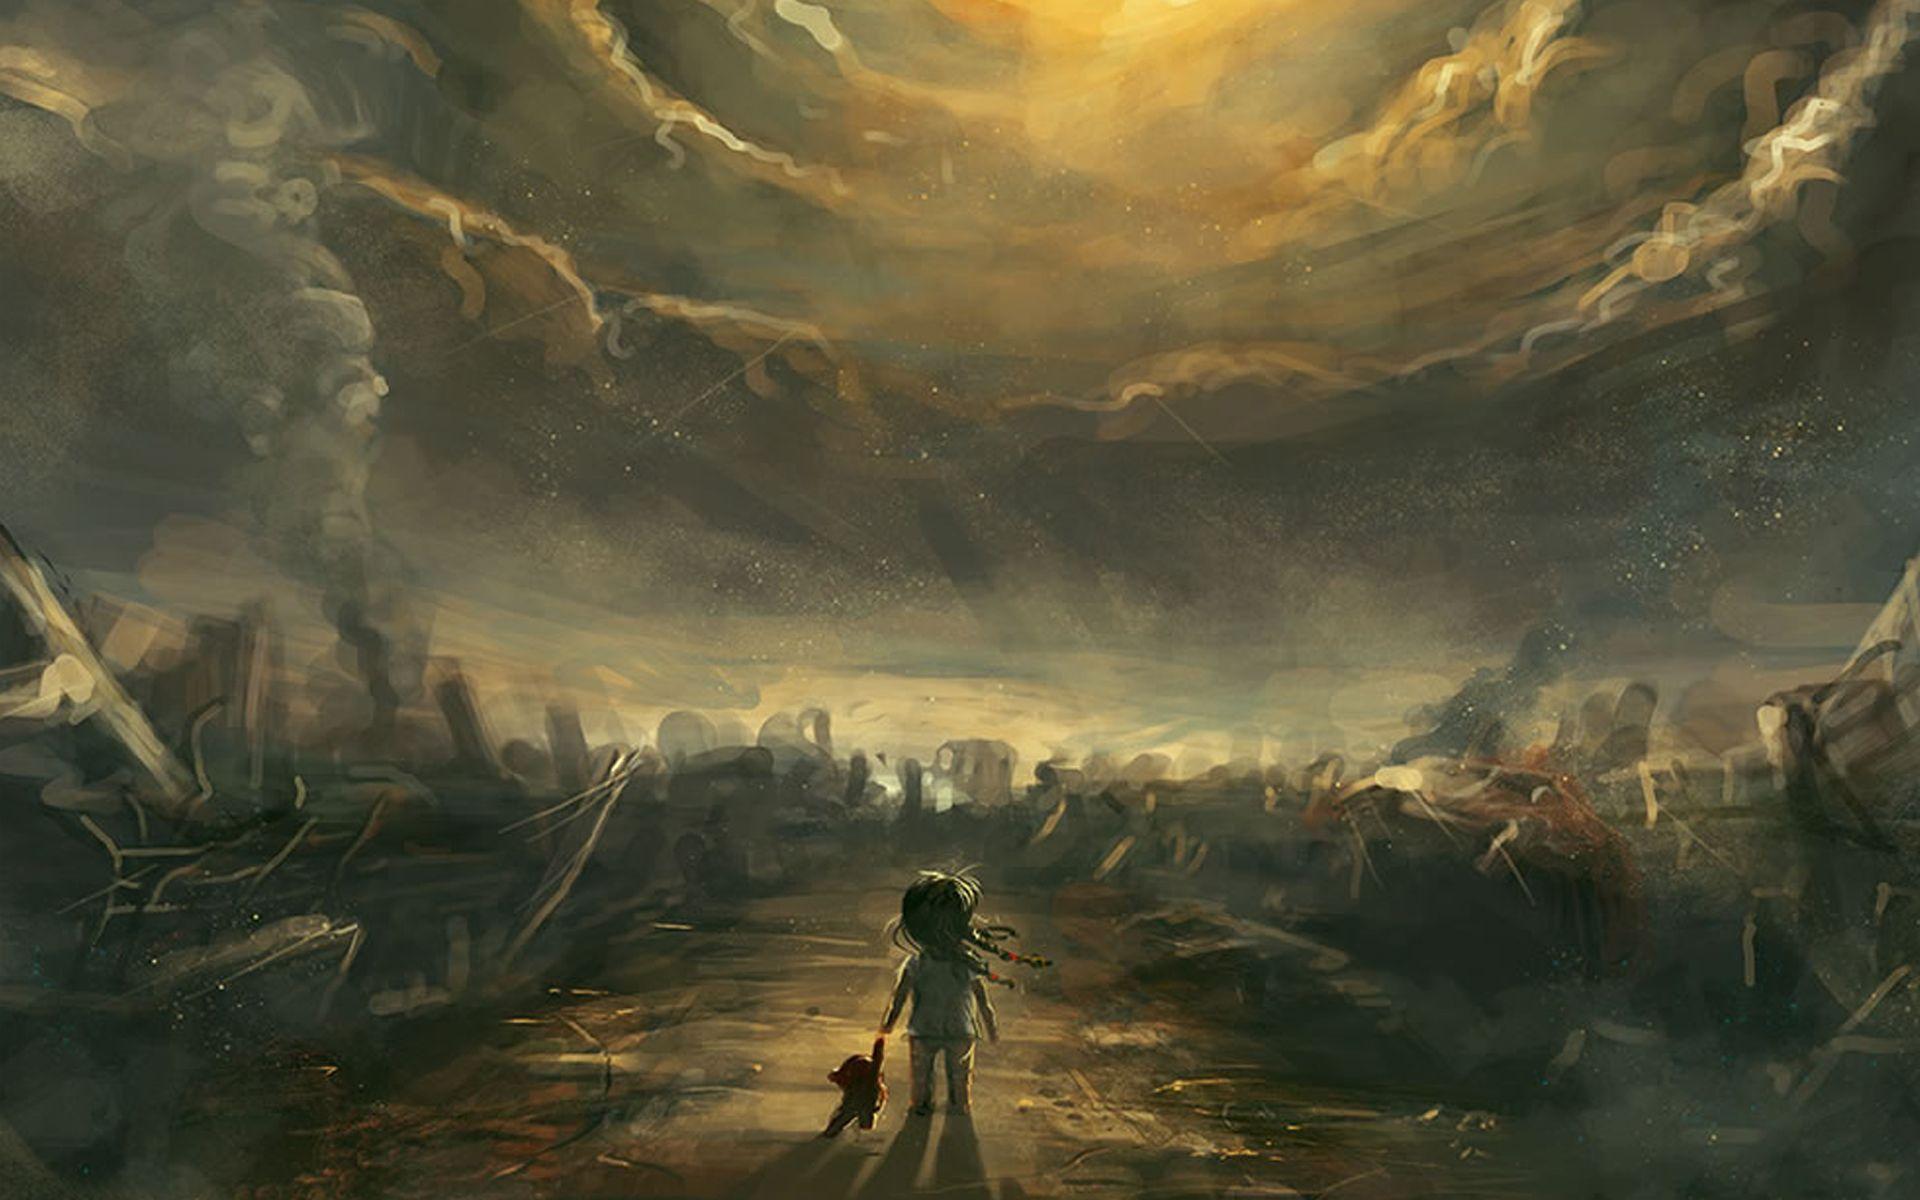 Post apocalyptic